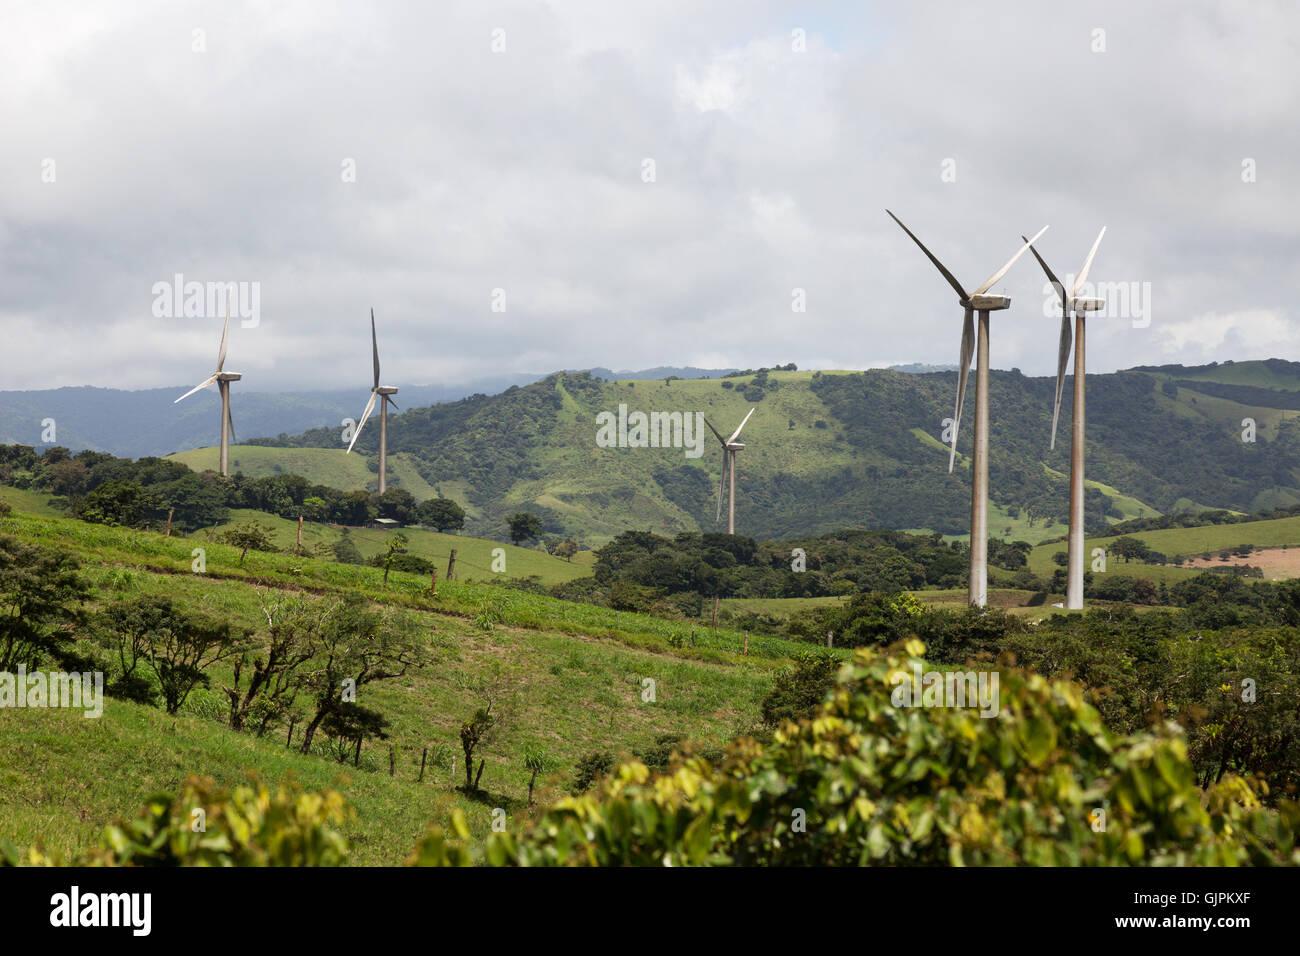 Windfarm with wind turbines, Alajuela province, Costa Rica, Central America - Stock Image